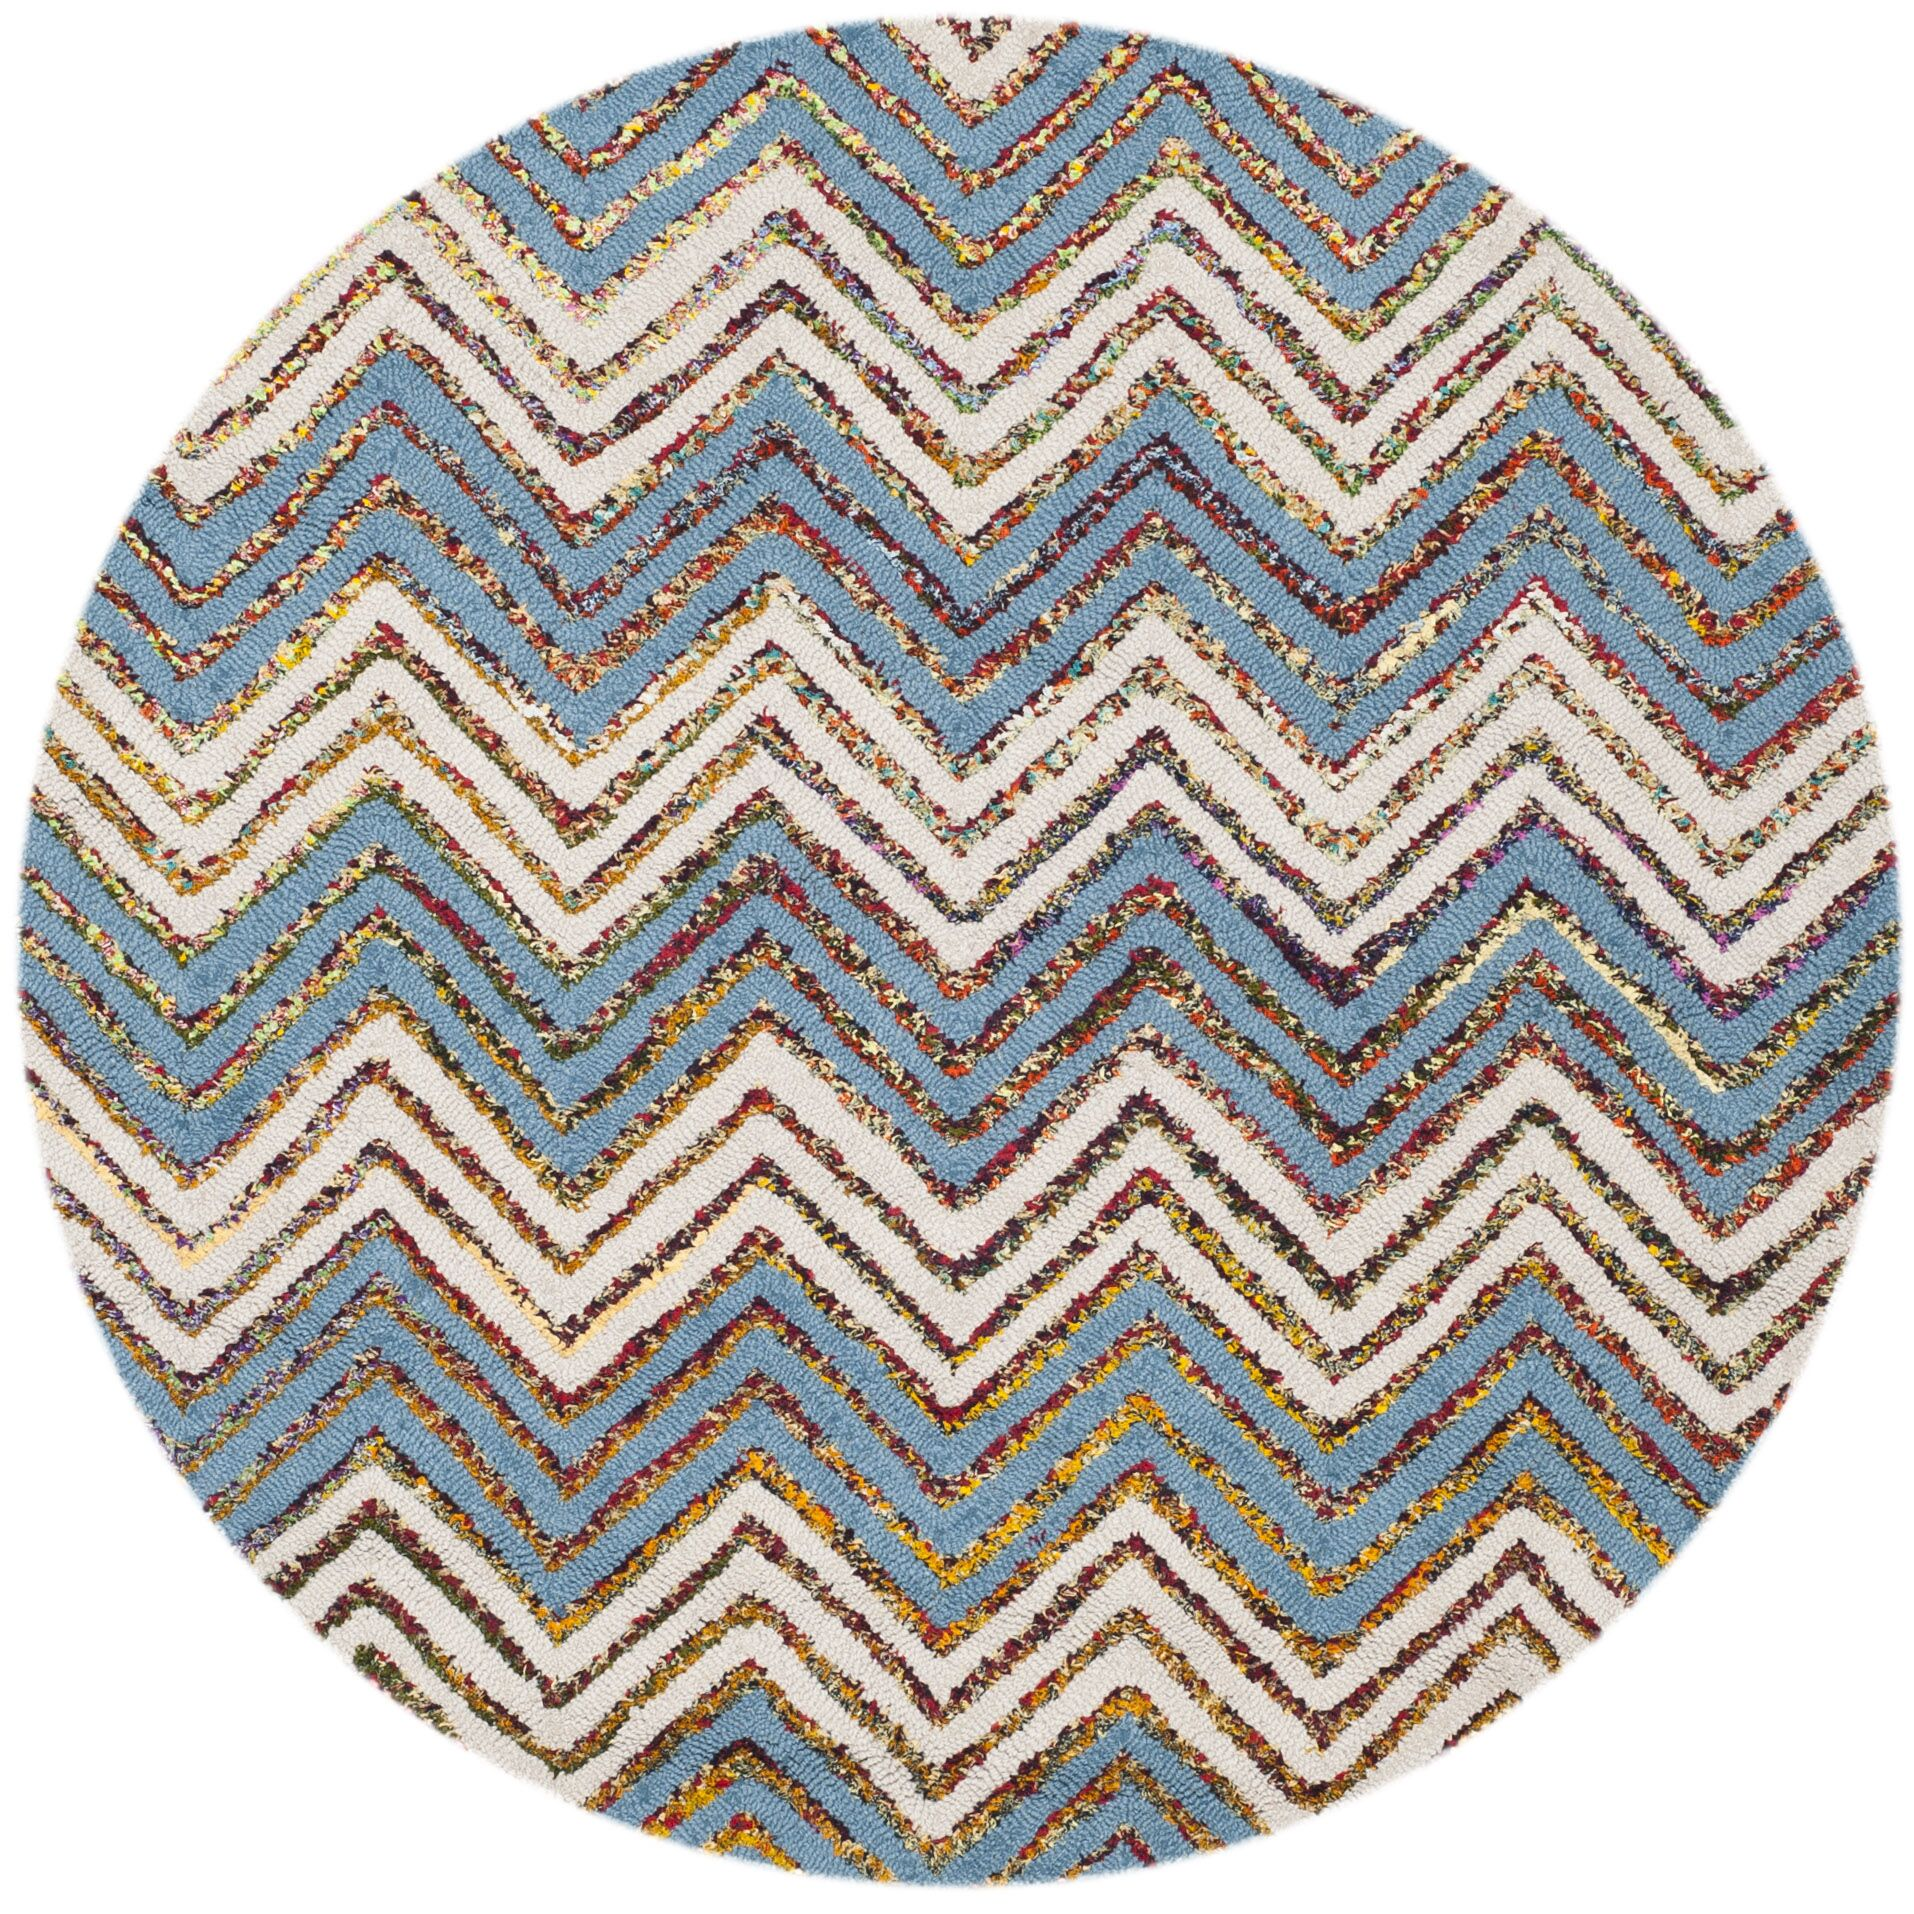 Tufted Cotton Beige/Blue Area Rug Rug Size: Round 4'